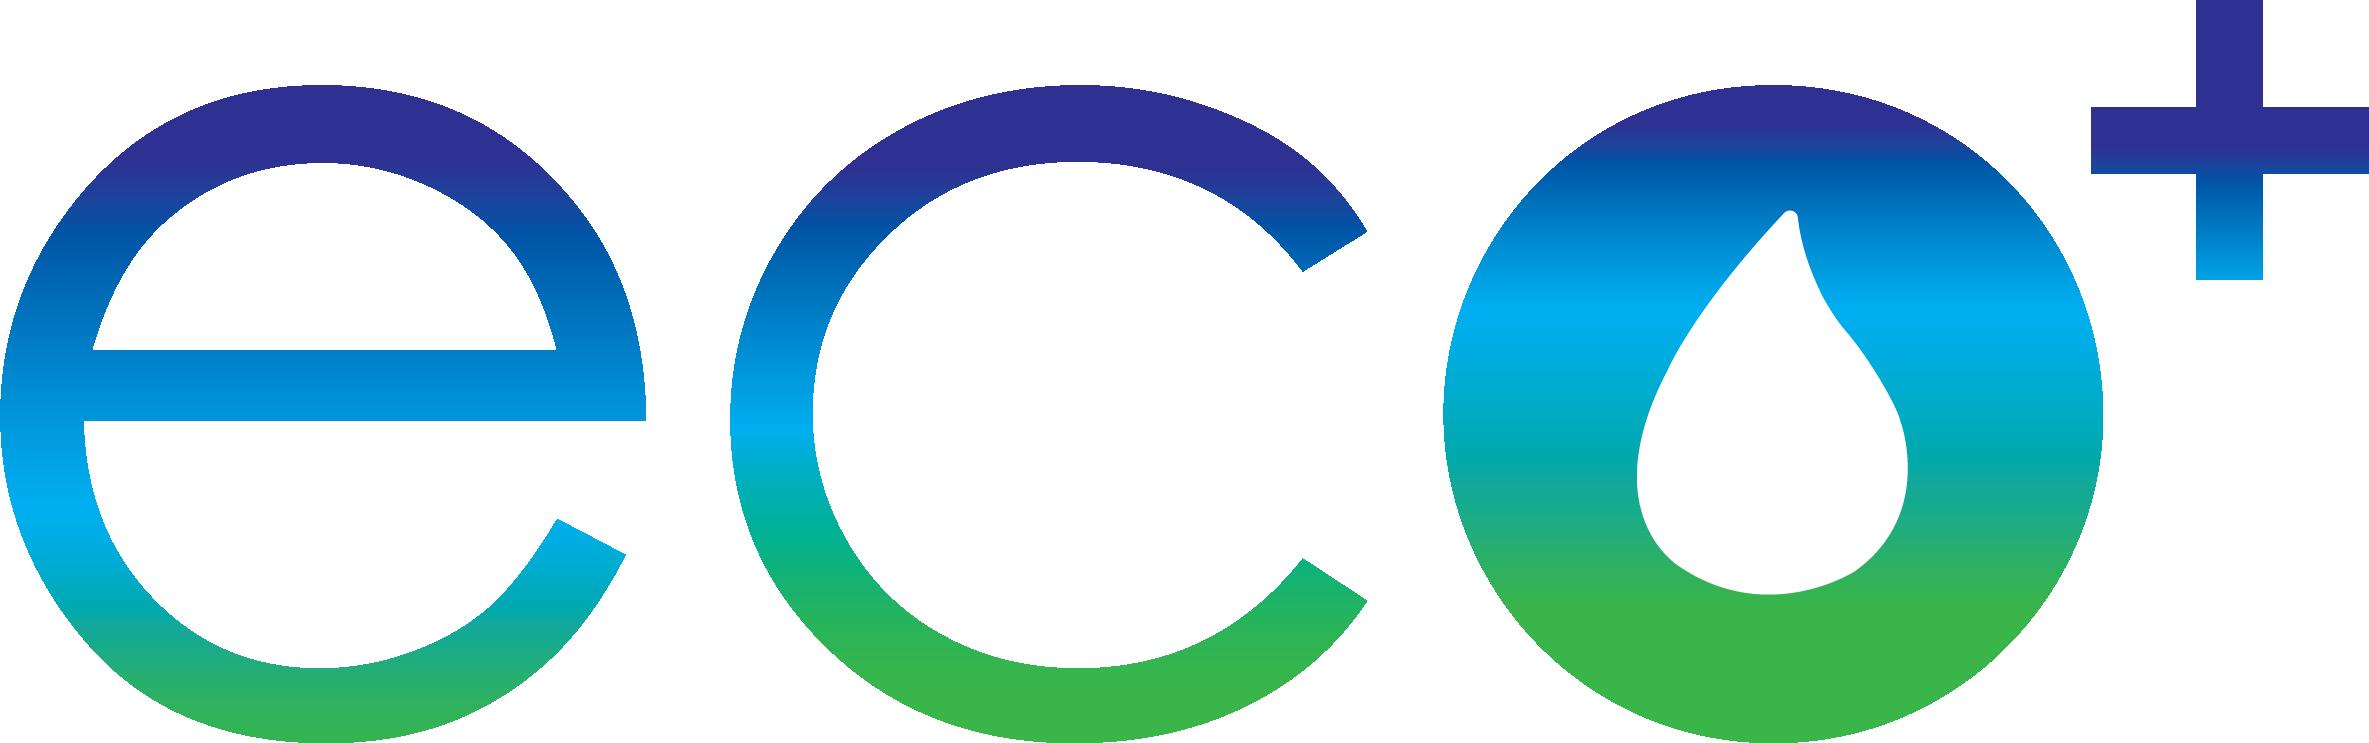 Eco-friendly pool logo